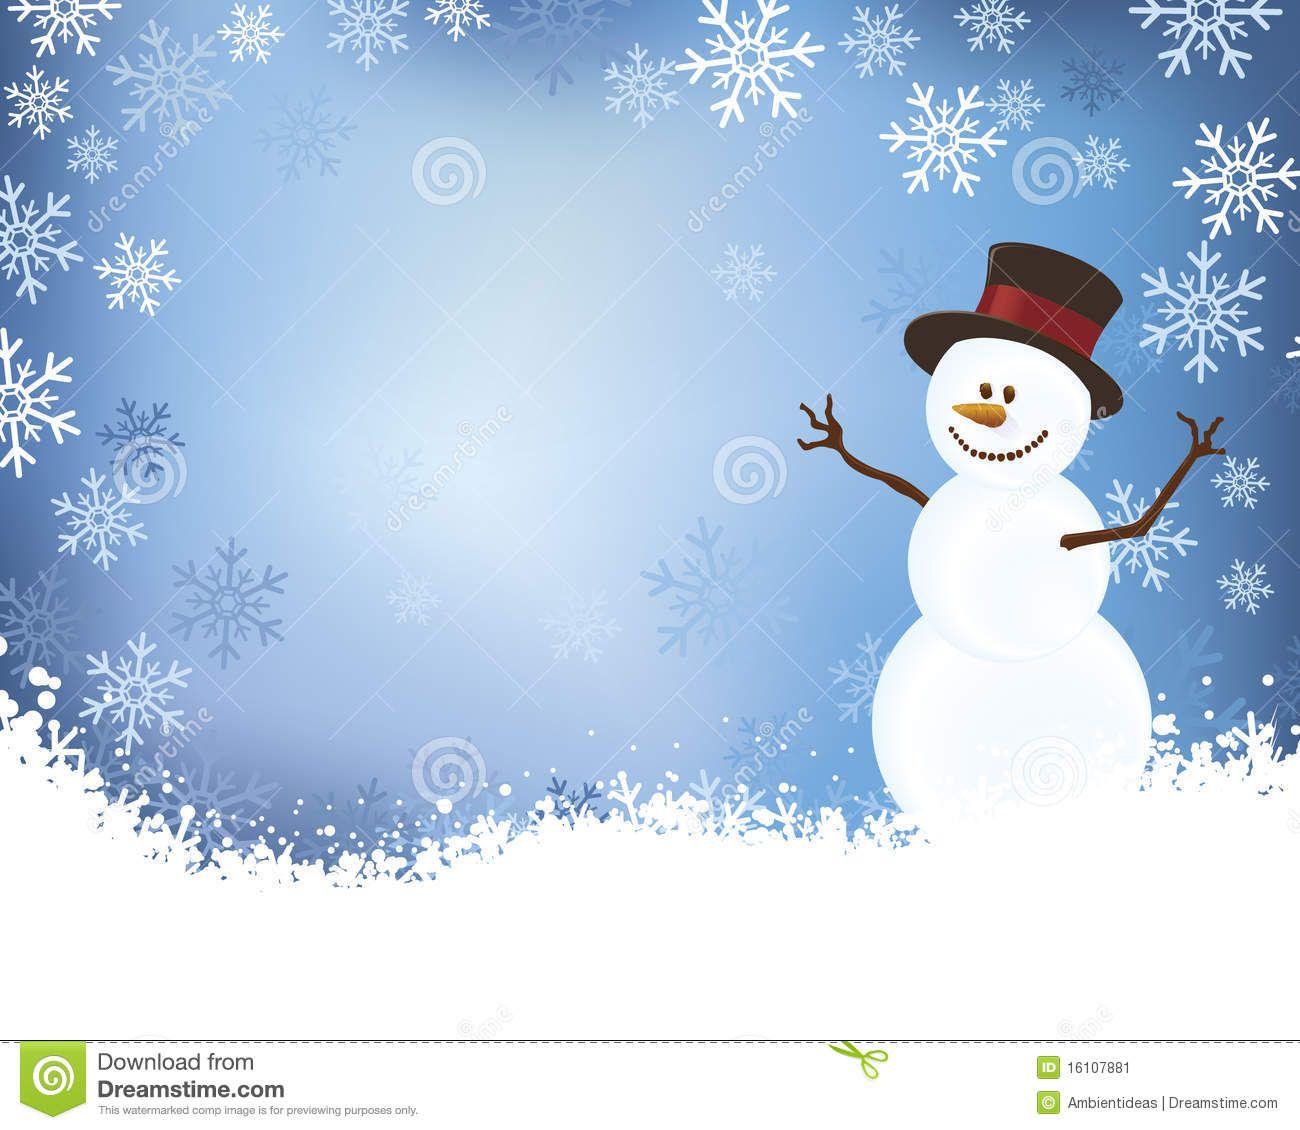 Snowflake clipart scene clip download Snowman on Blue Winter Scene Background Stock Image ... clip download